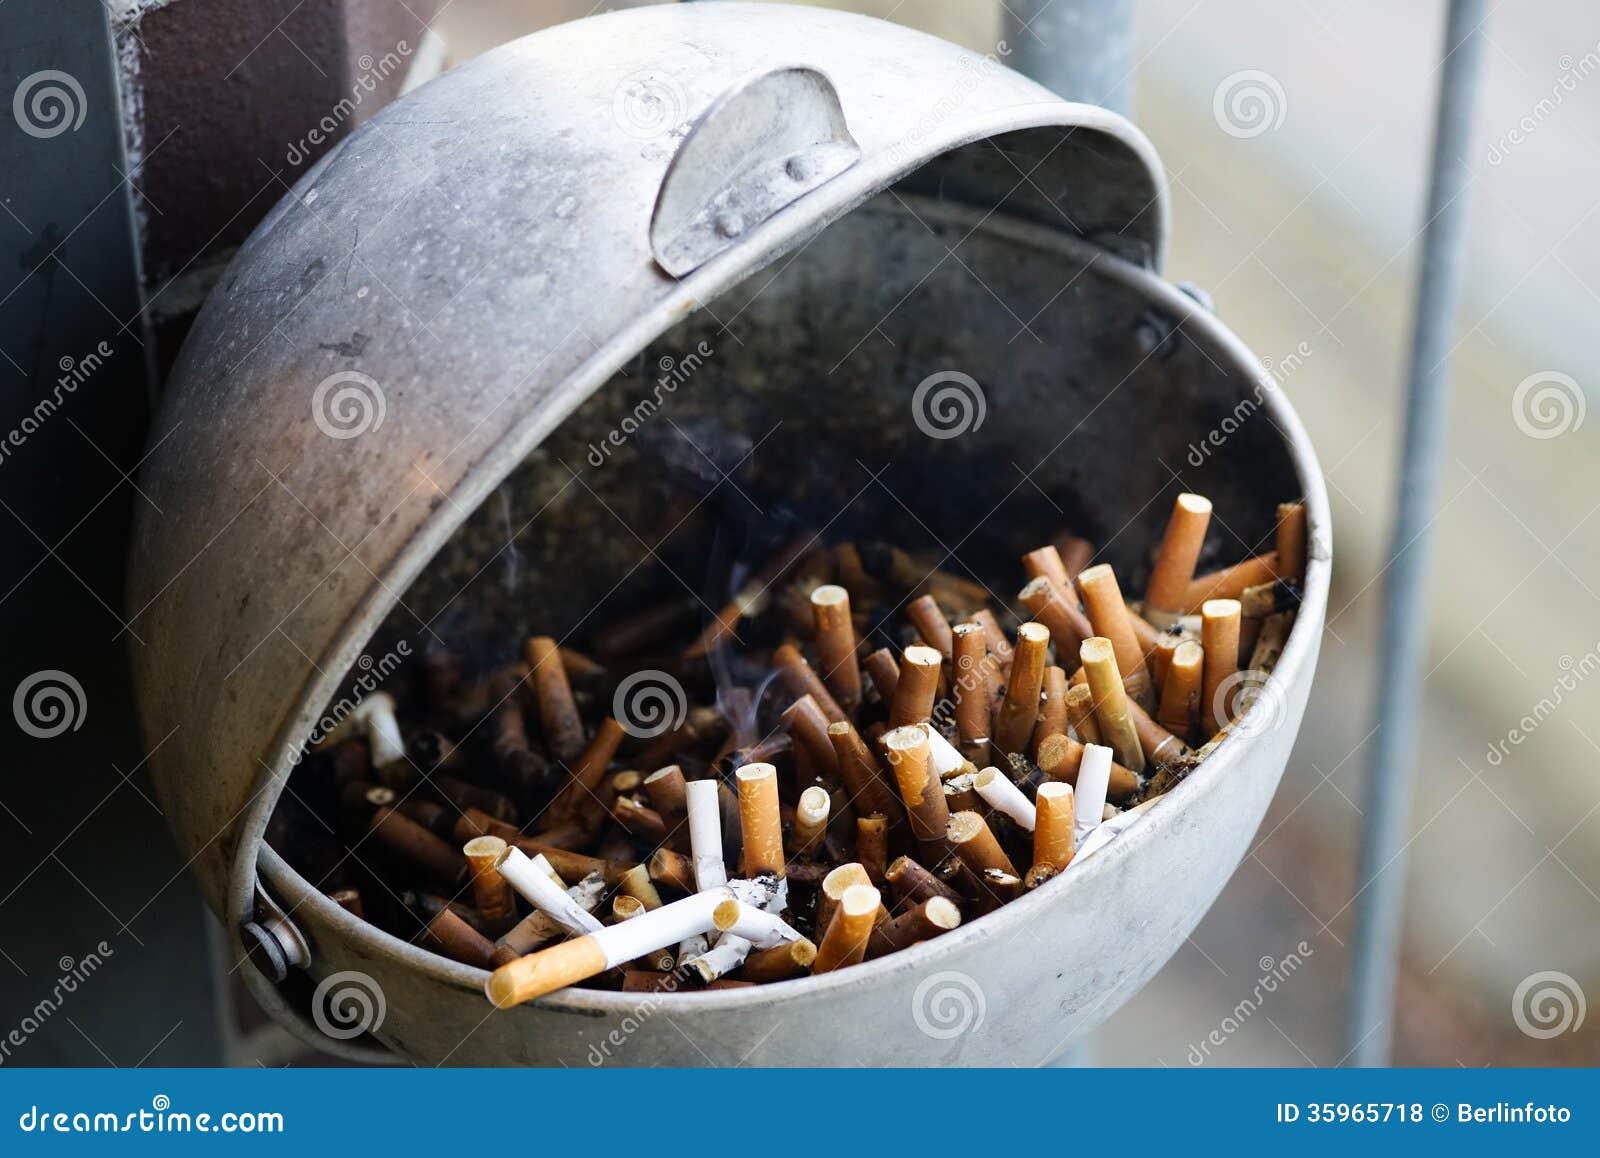 Cenicero por completo de cigarrillos usados